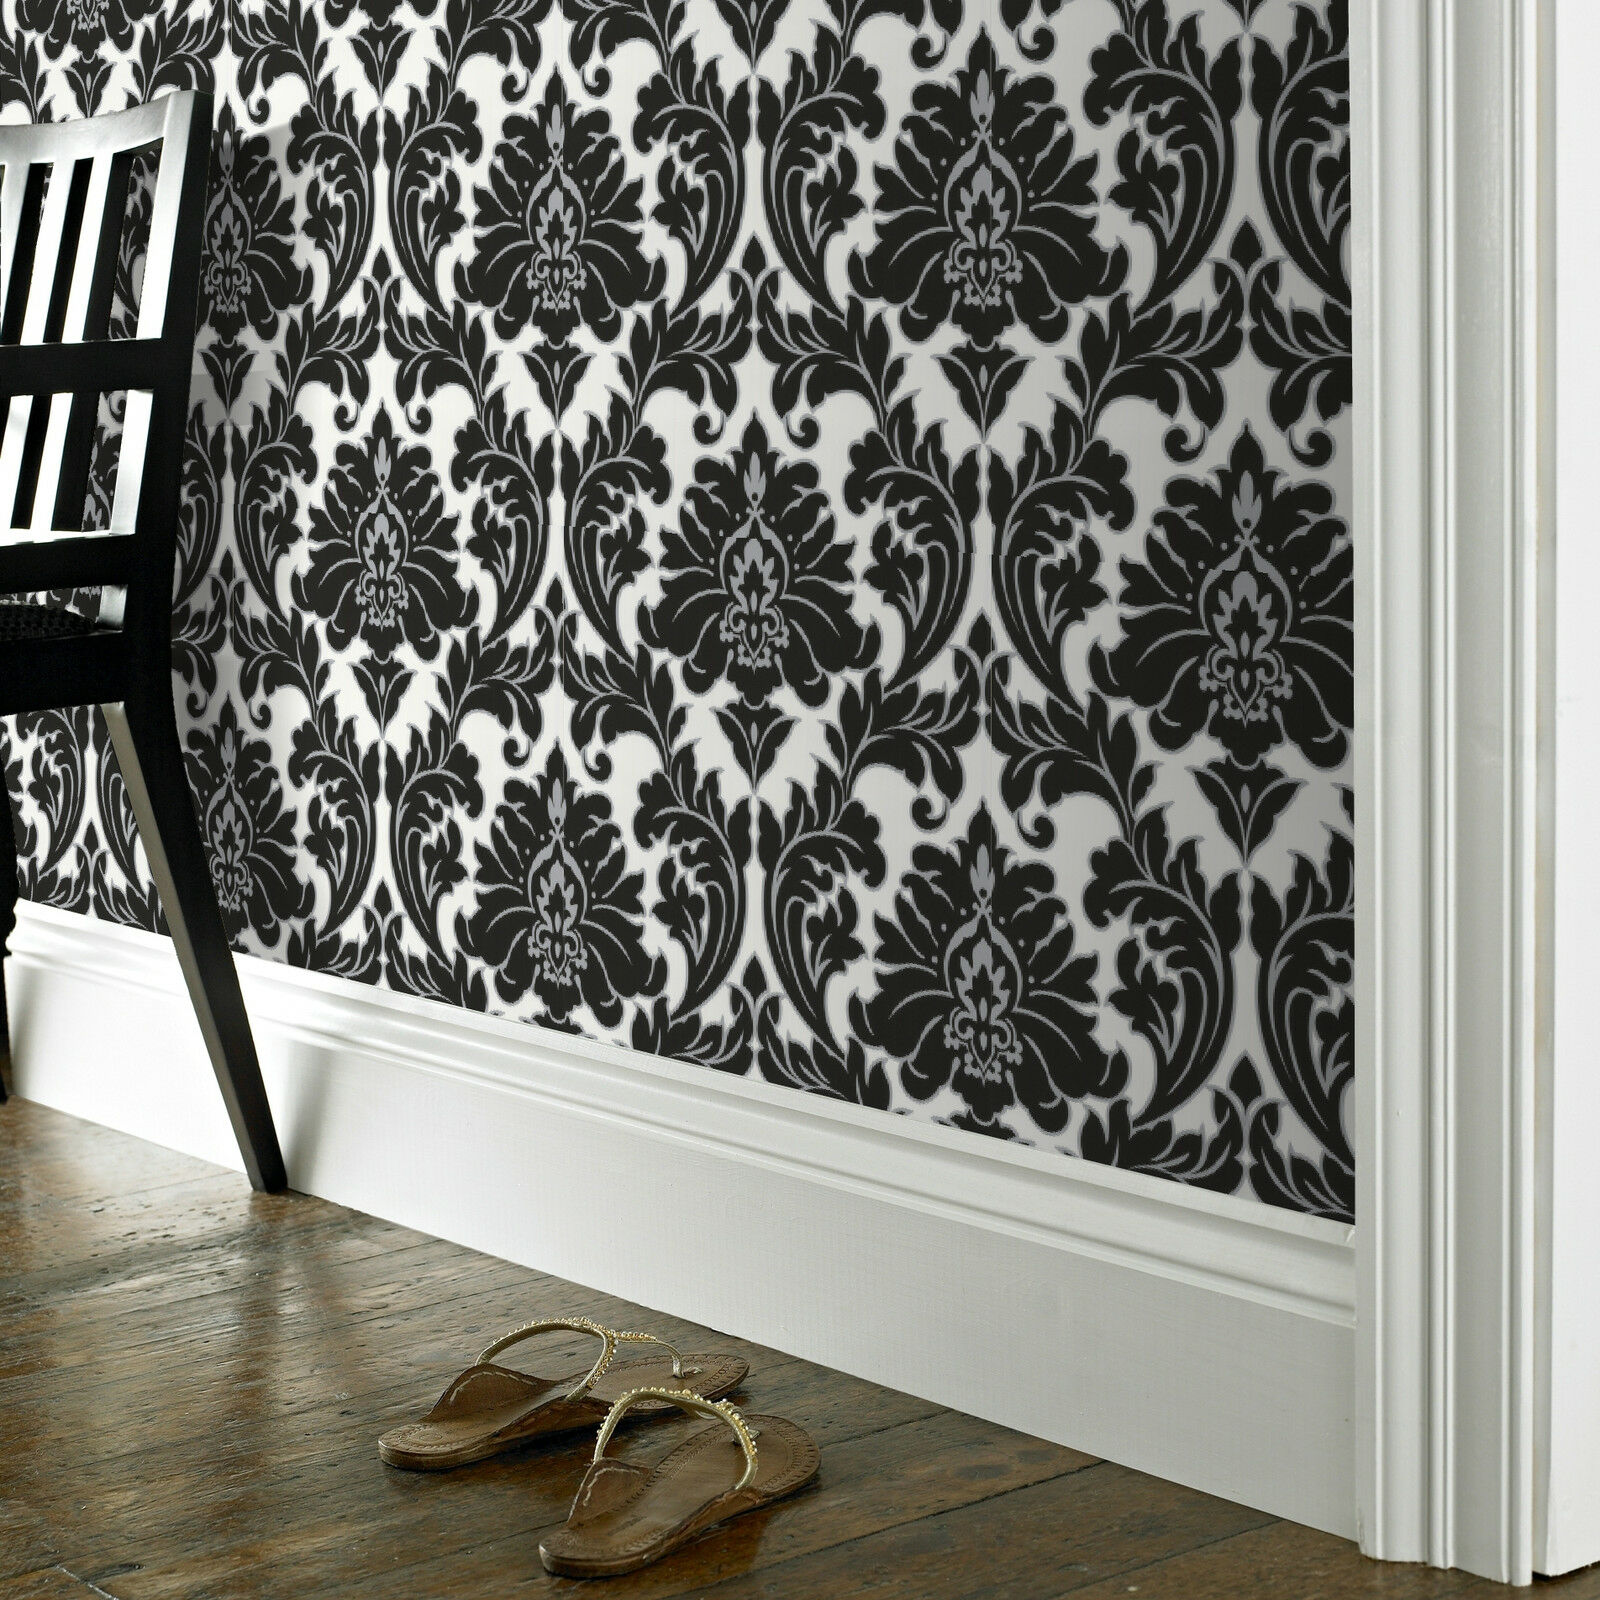 vlies tapete barock muster ornament schwarz wei silber klassisch neo barock 3 - Tapete Schwarz Weis Muster